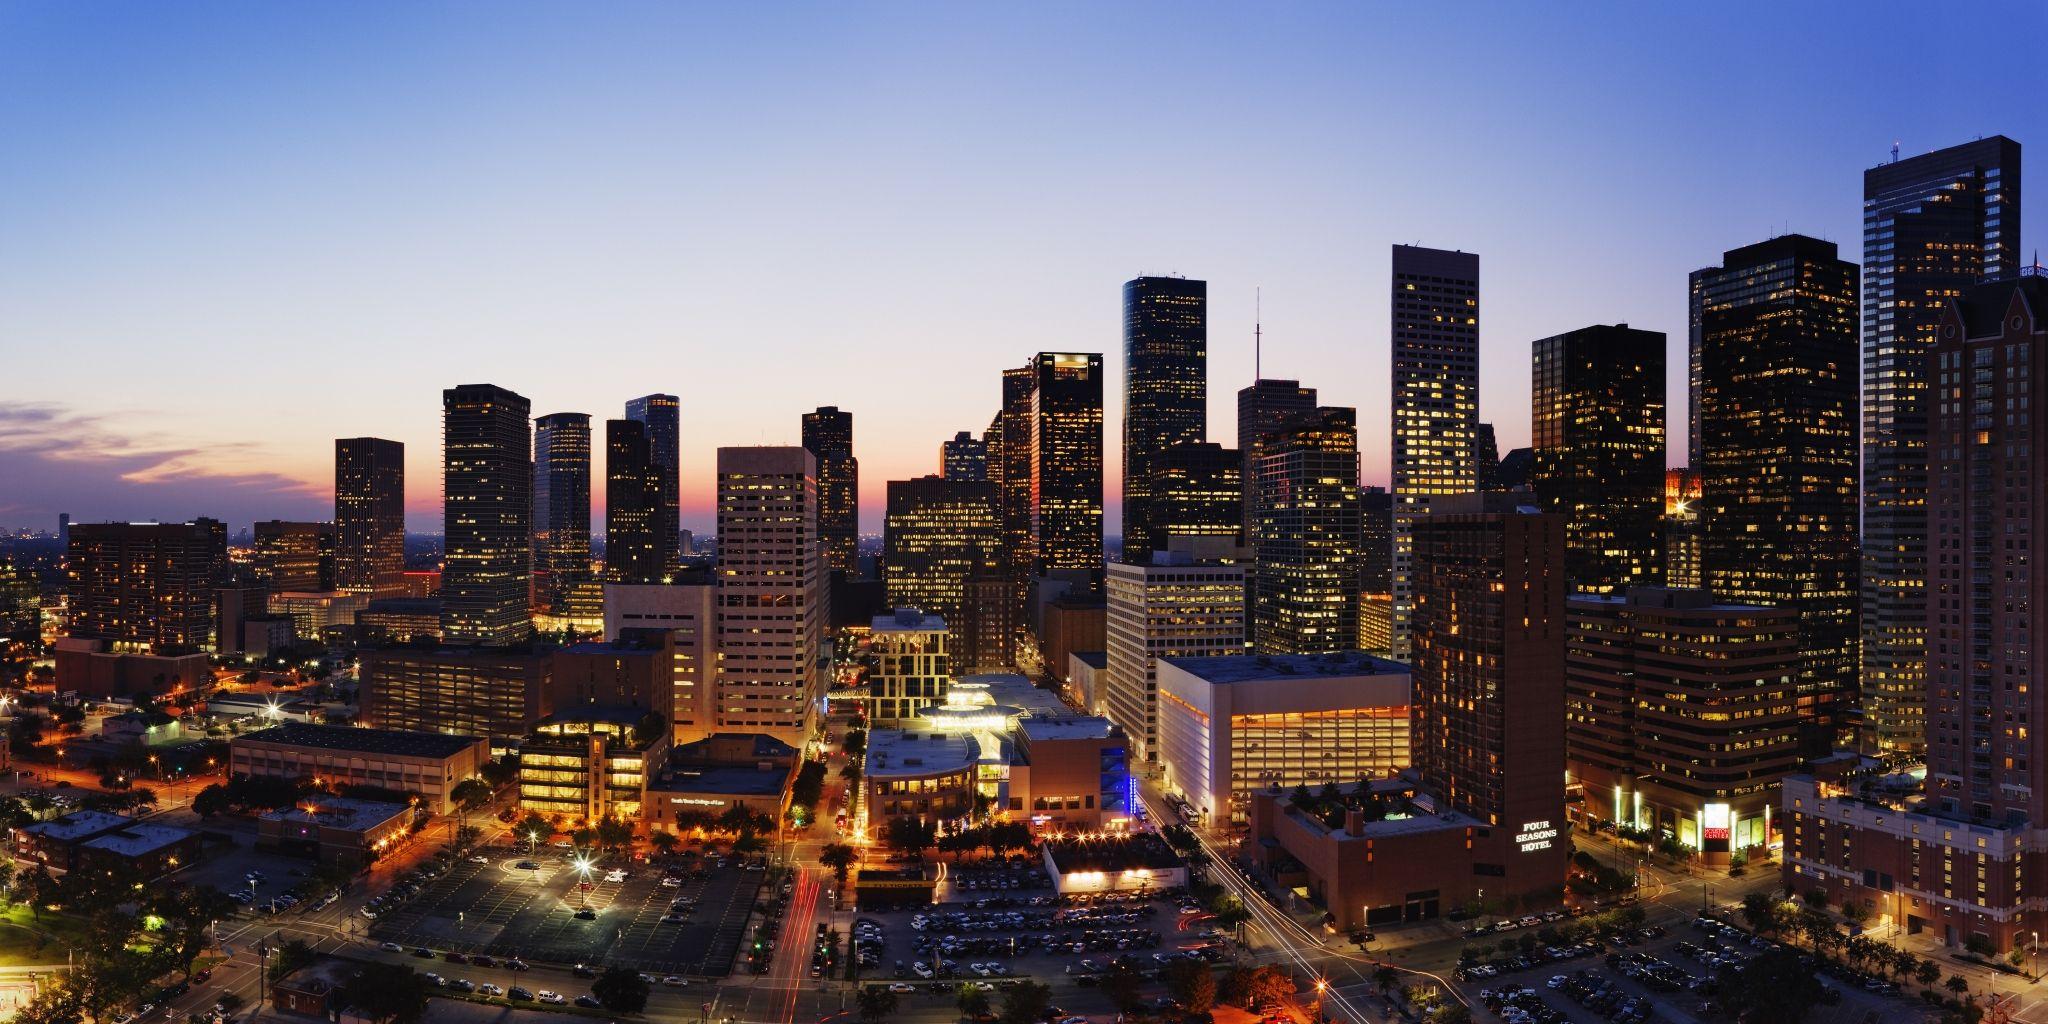 Hanover Post Oak ǀ Gallery ǀ Houston High Rise Apartments Houston Luxury Luxury High Rise High Rise Apartments